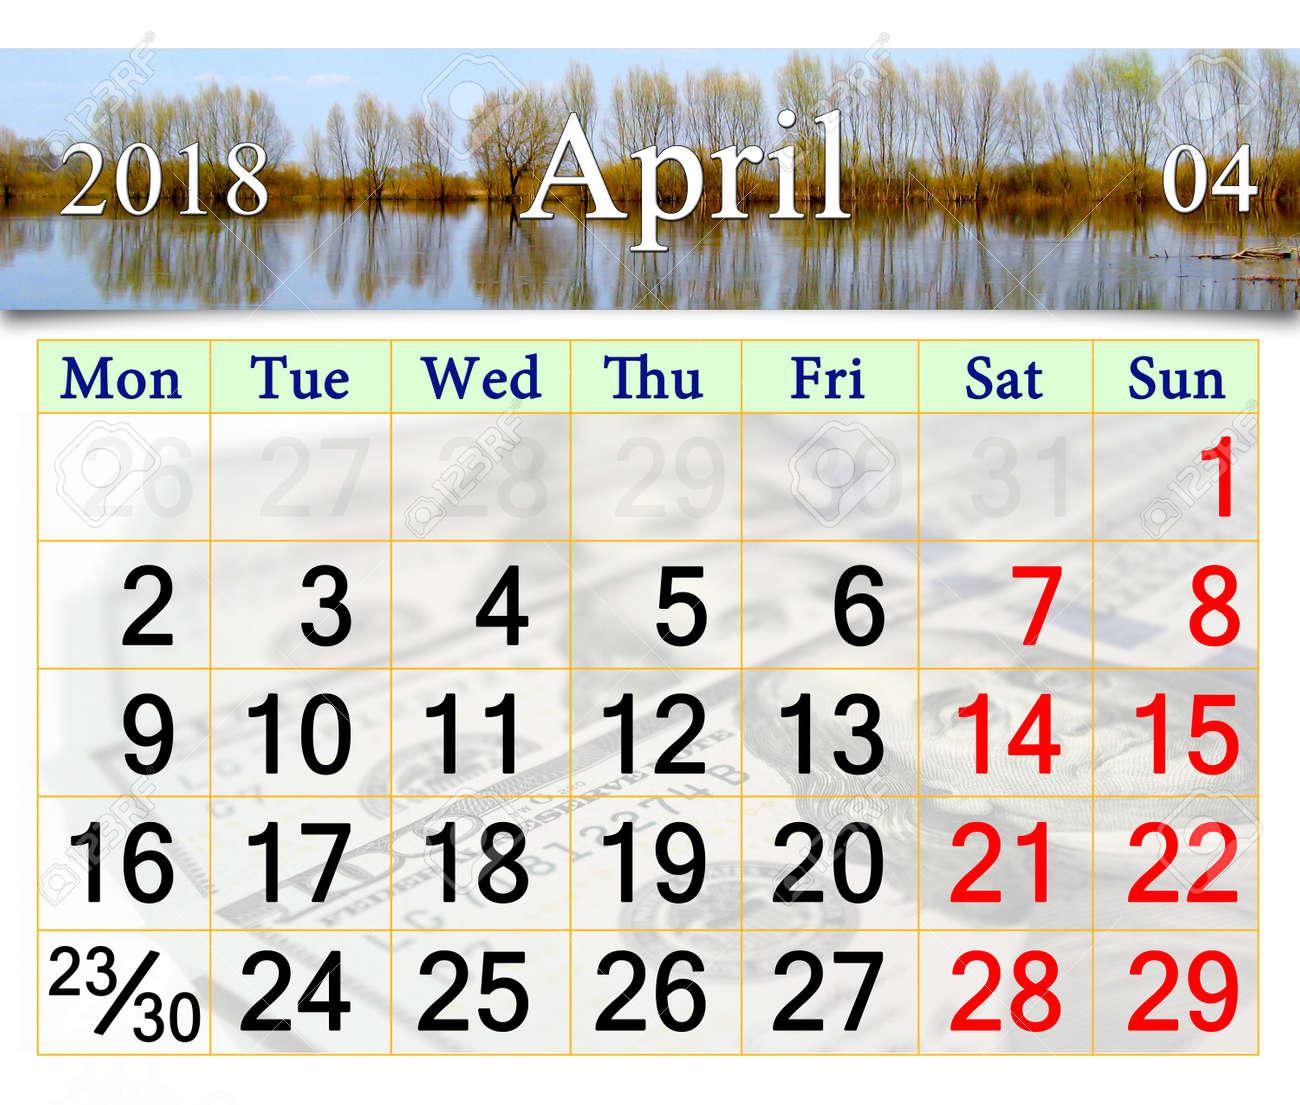 6e9f14edf7e7 beautiful calendar for April 2018 on the background of spring flood Stock  Photo - 89045012